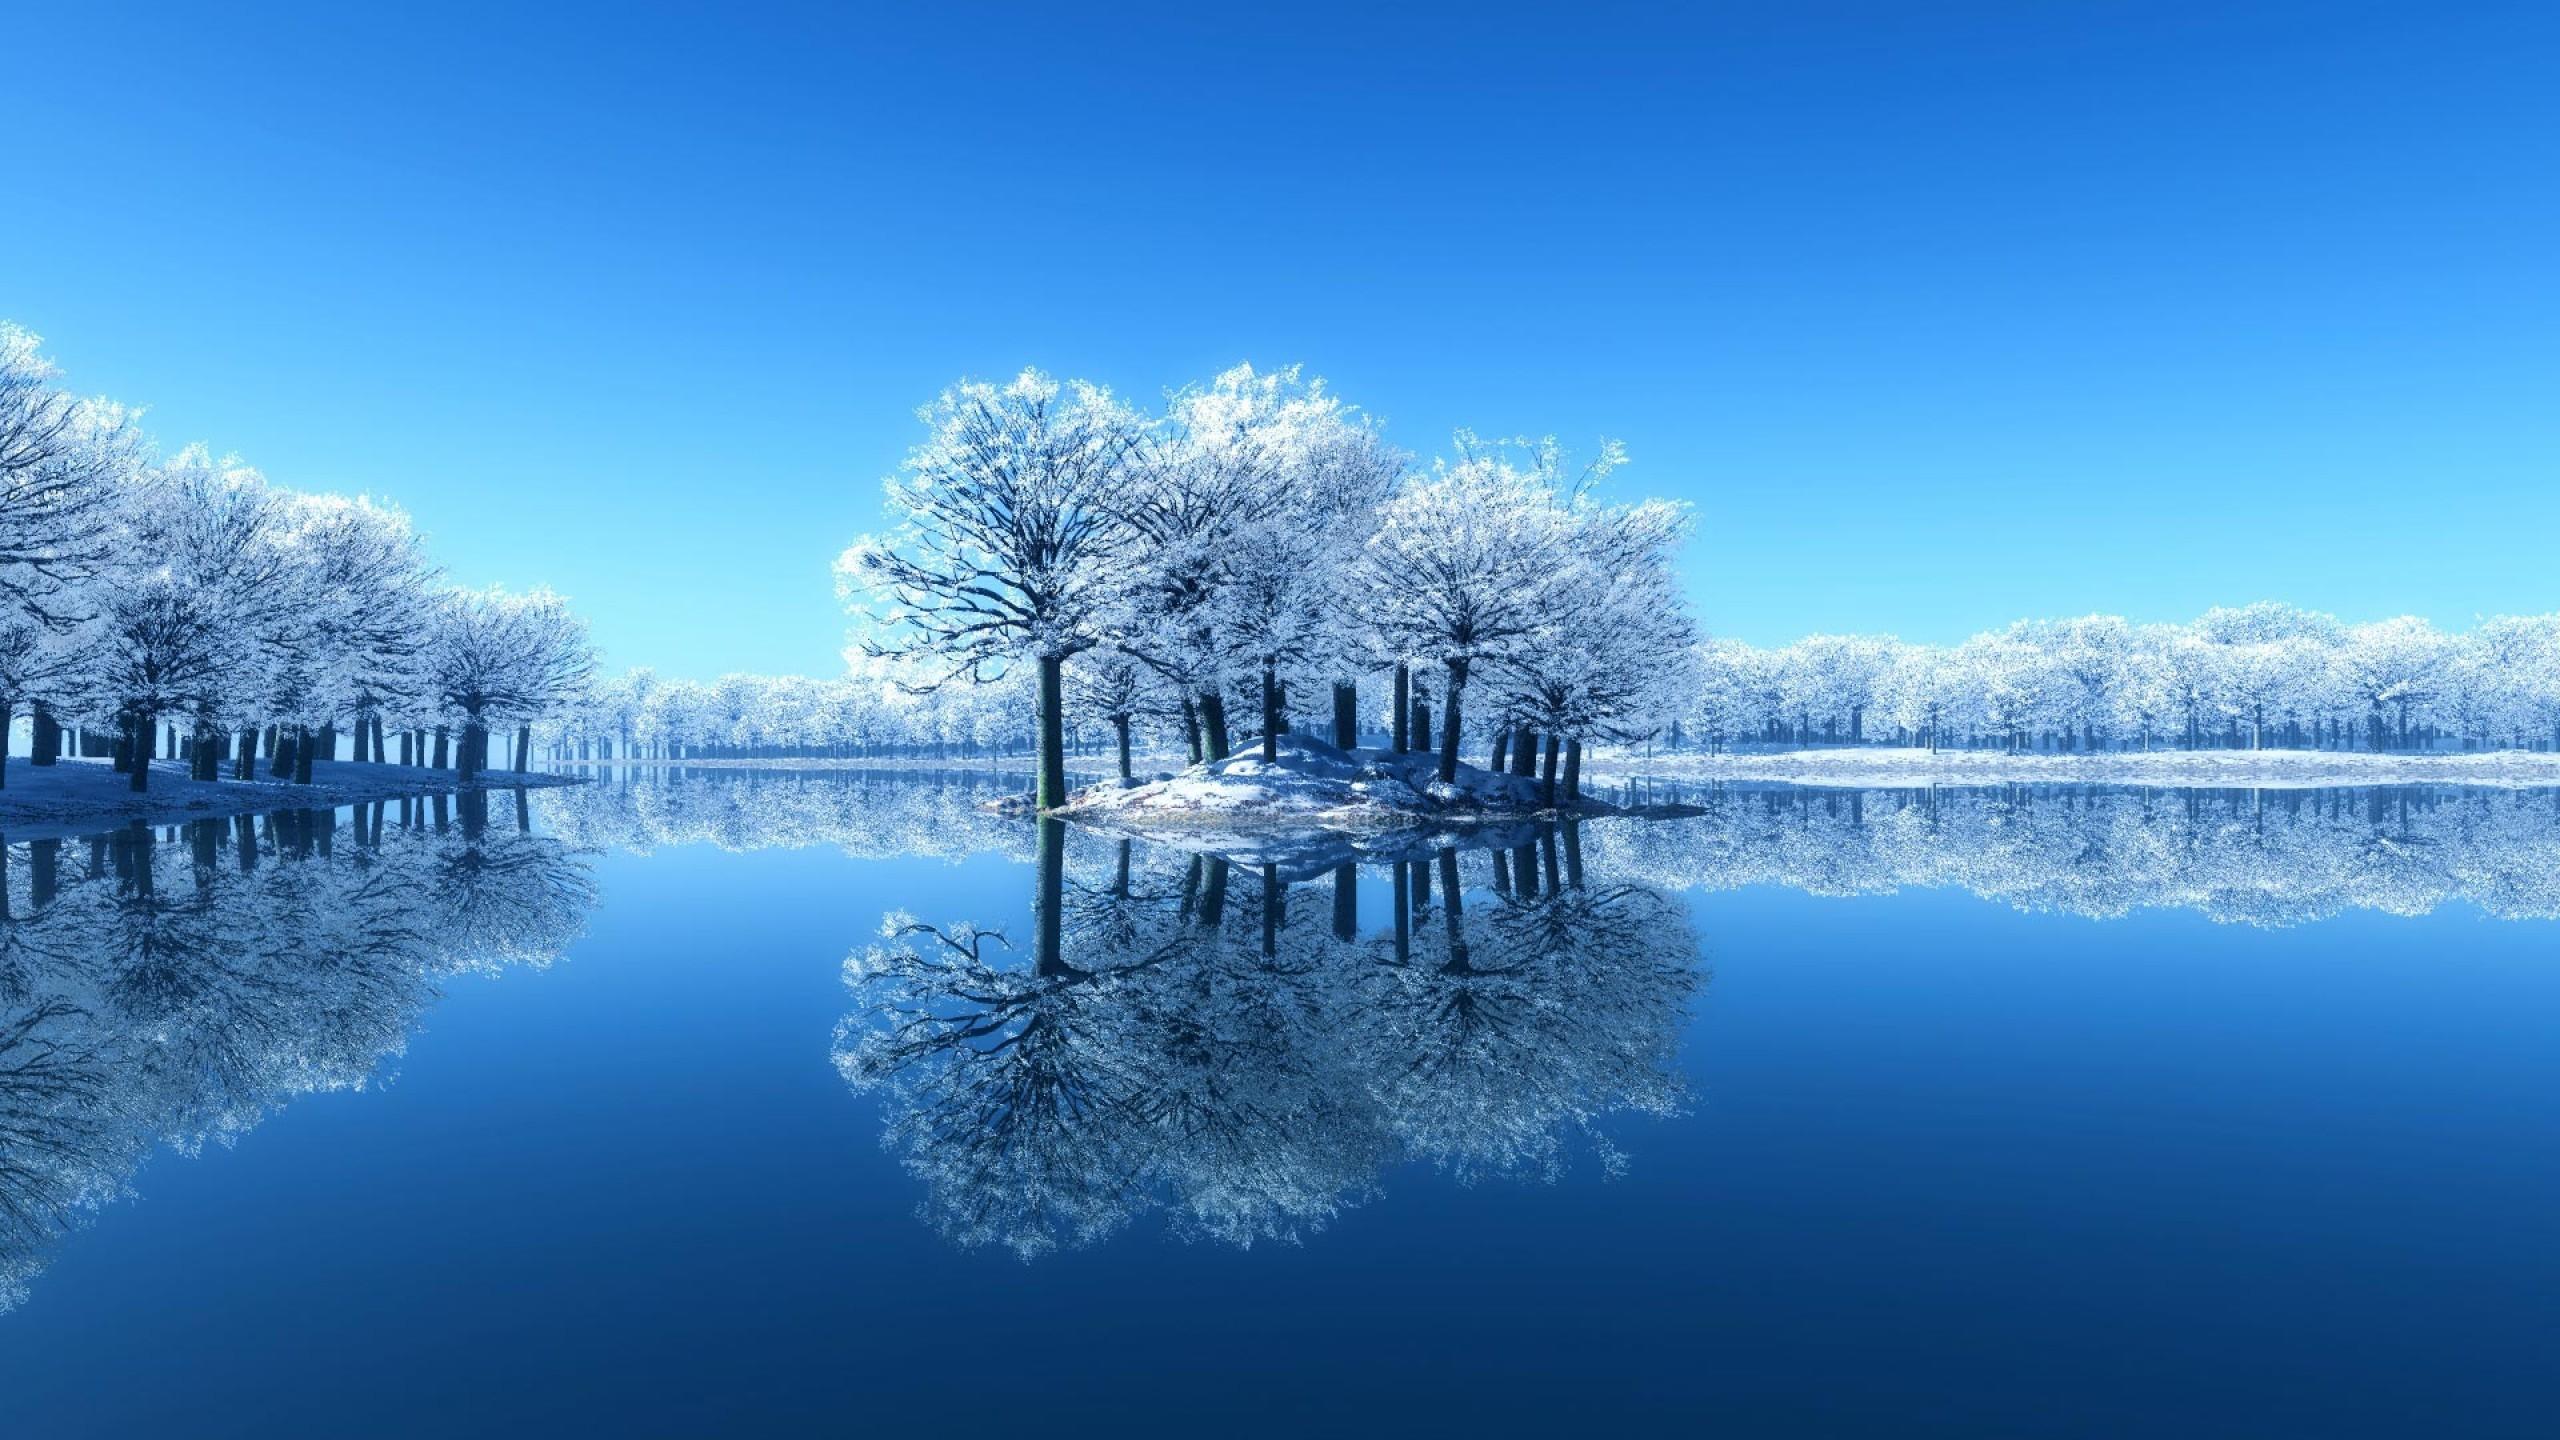 Pictures Of Lake At Winter For Wallpaper Desktop Wallpaper